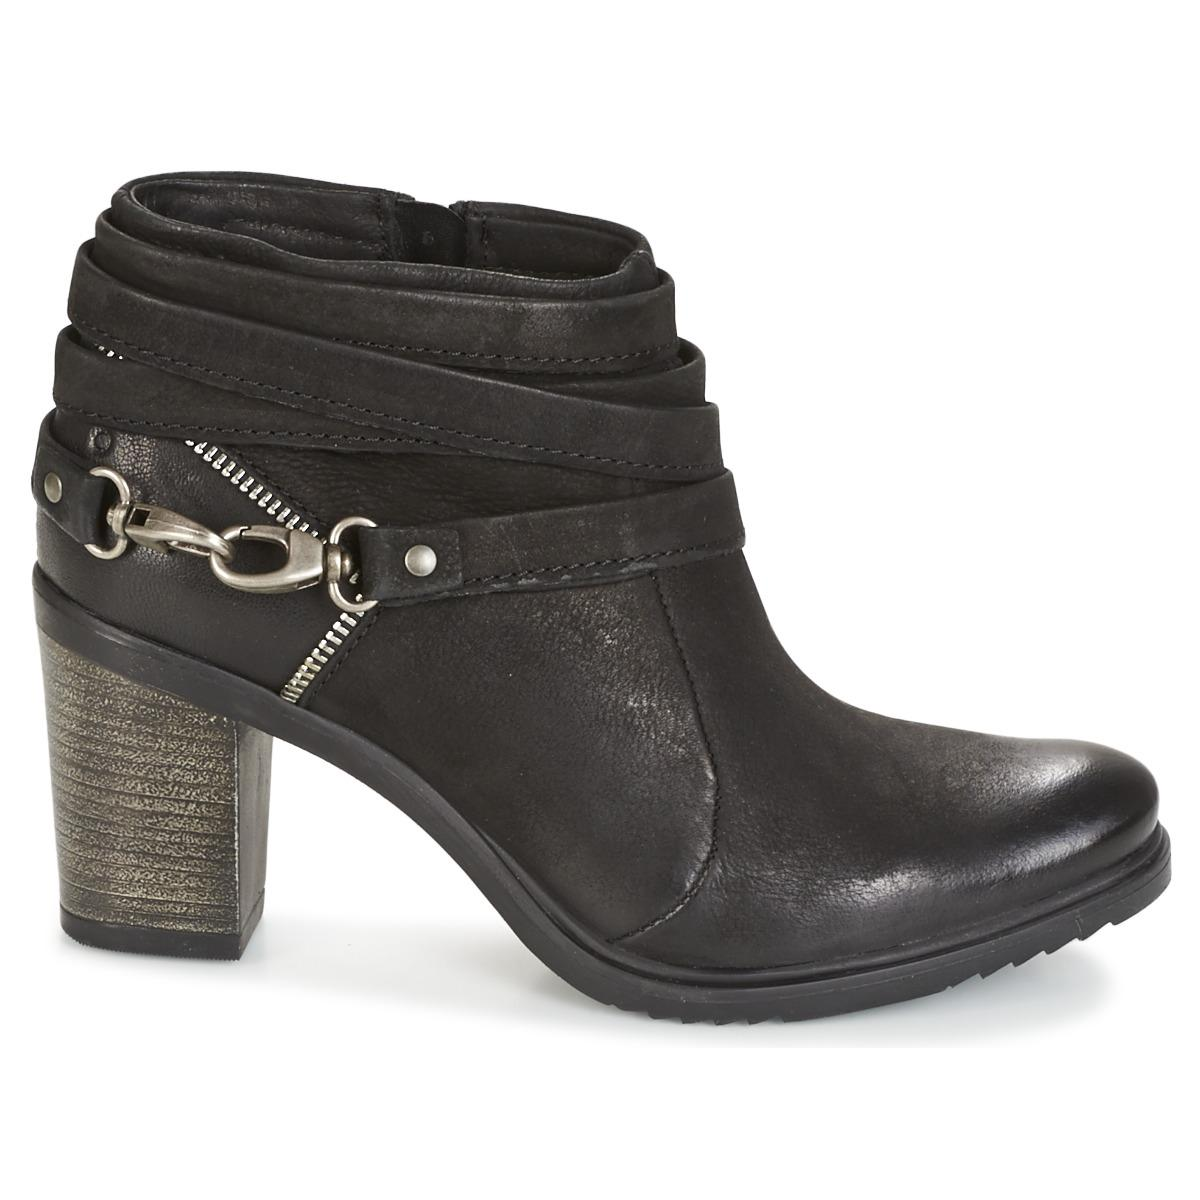 HANFINE Boots Cuir Dream in Green en coloris Noir